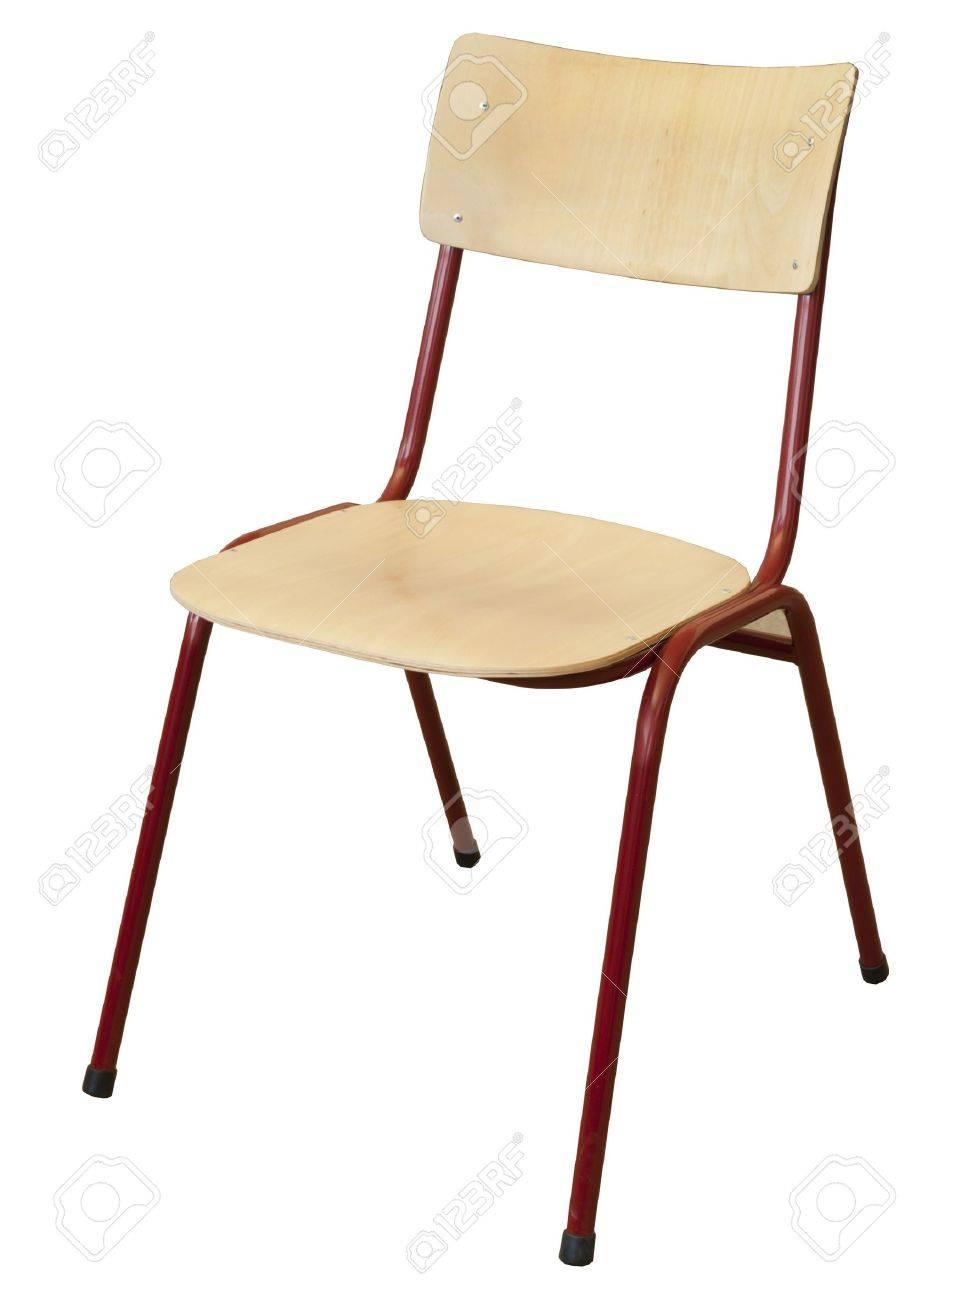 metal and wood school chair